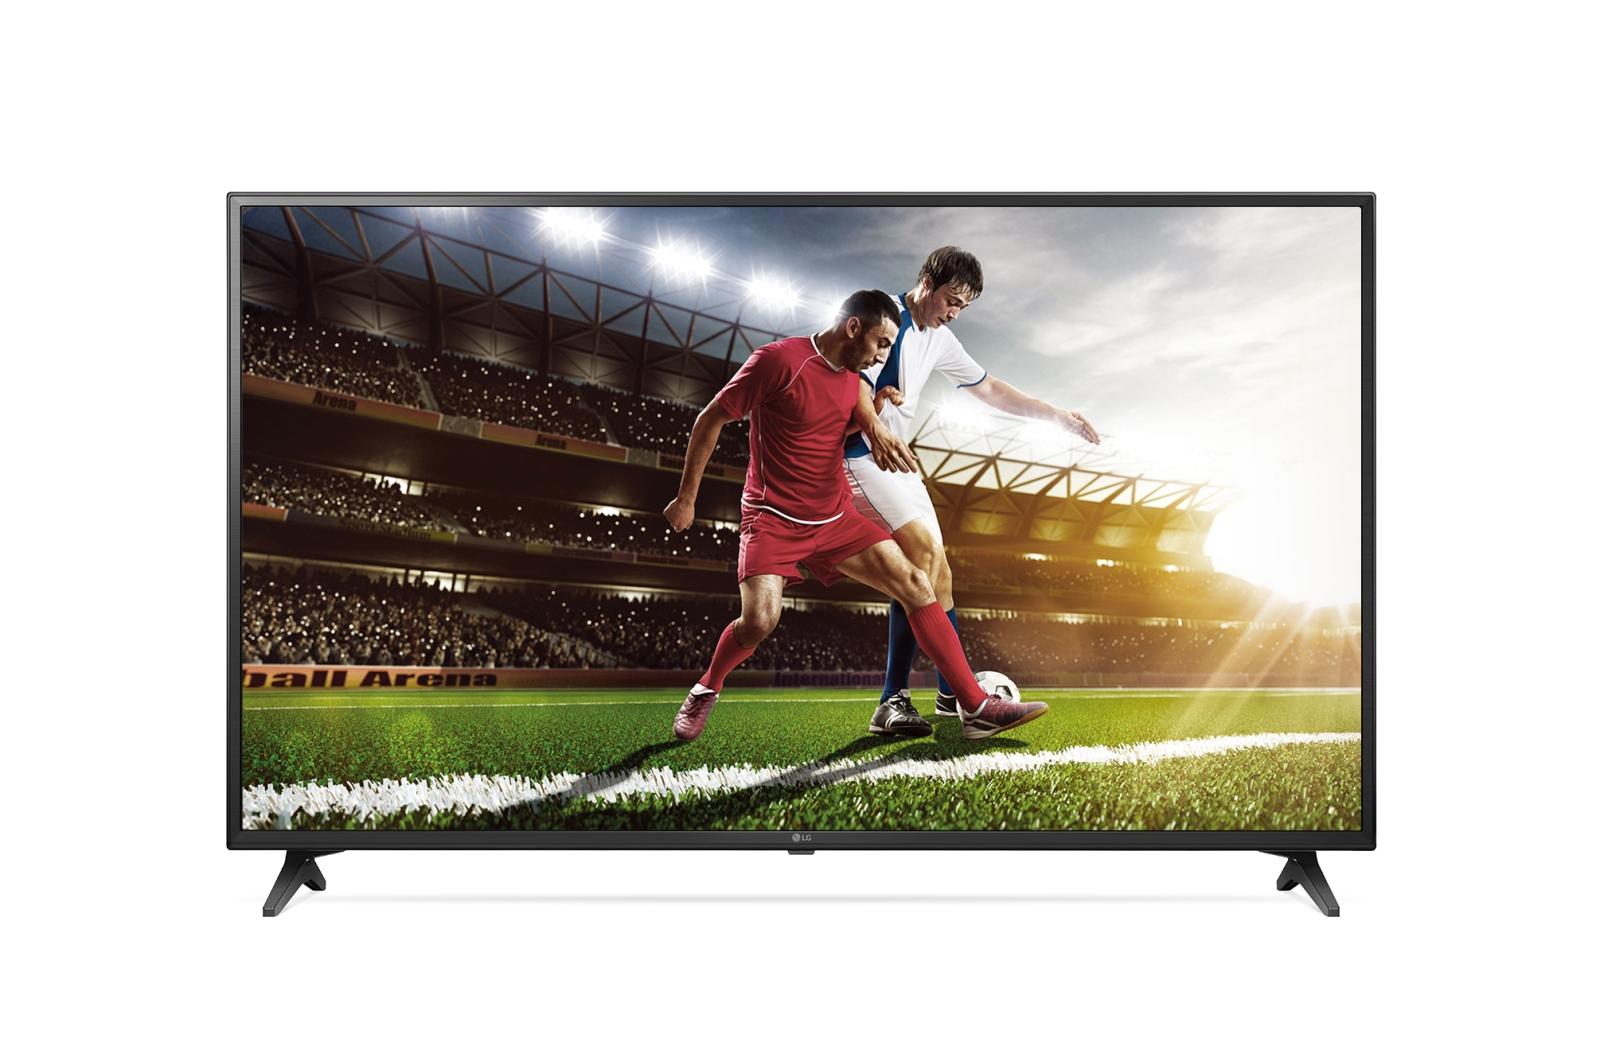 Televizor Led Lg Smart Tv 60uu640c 162cm Comercial 4k Ultra Hd Negru